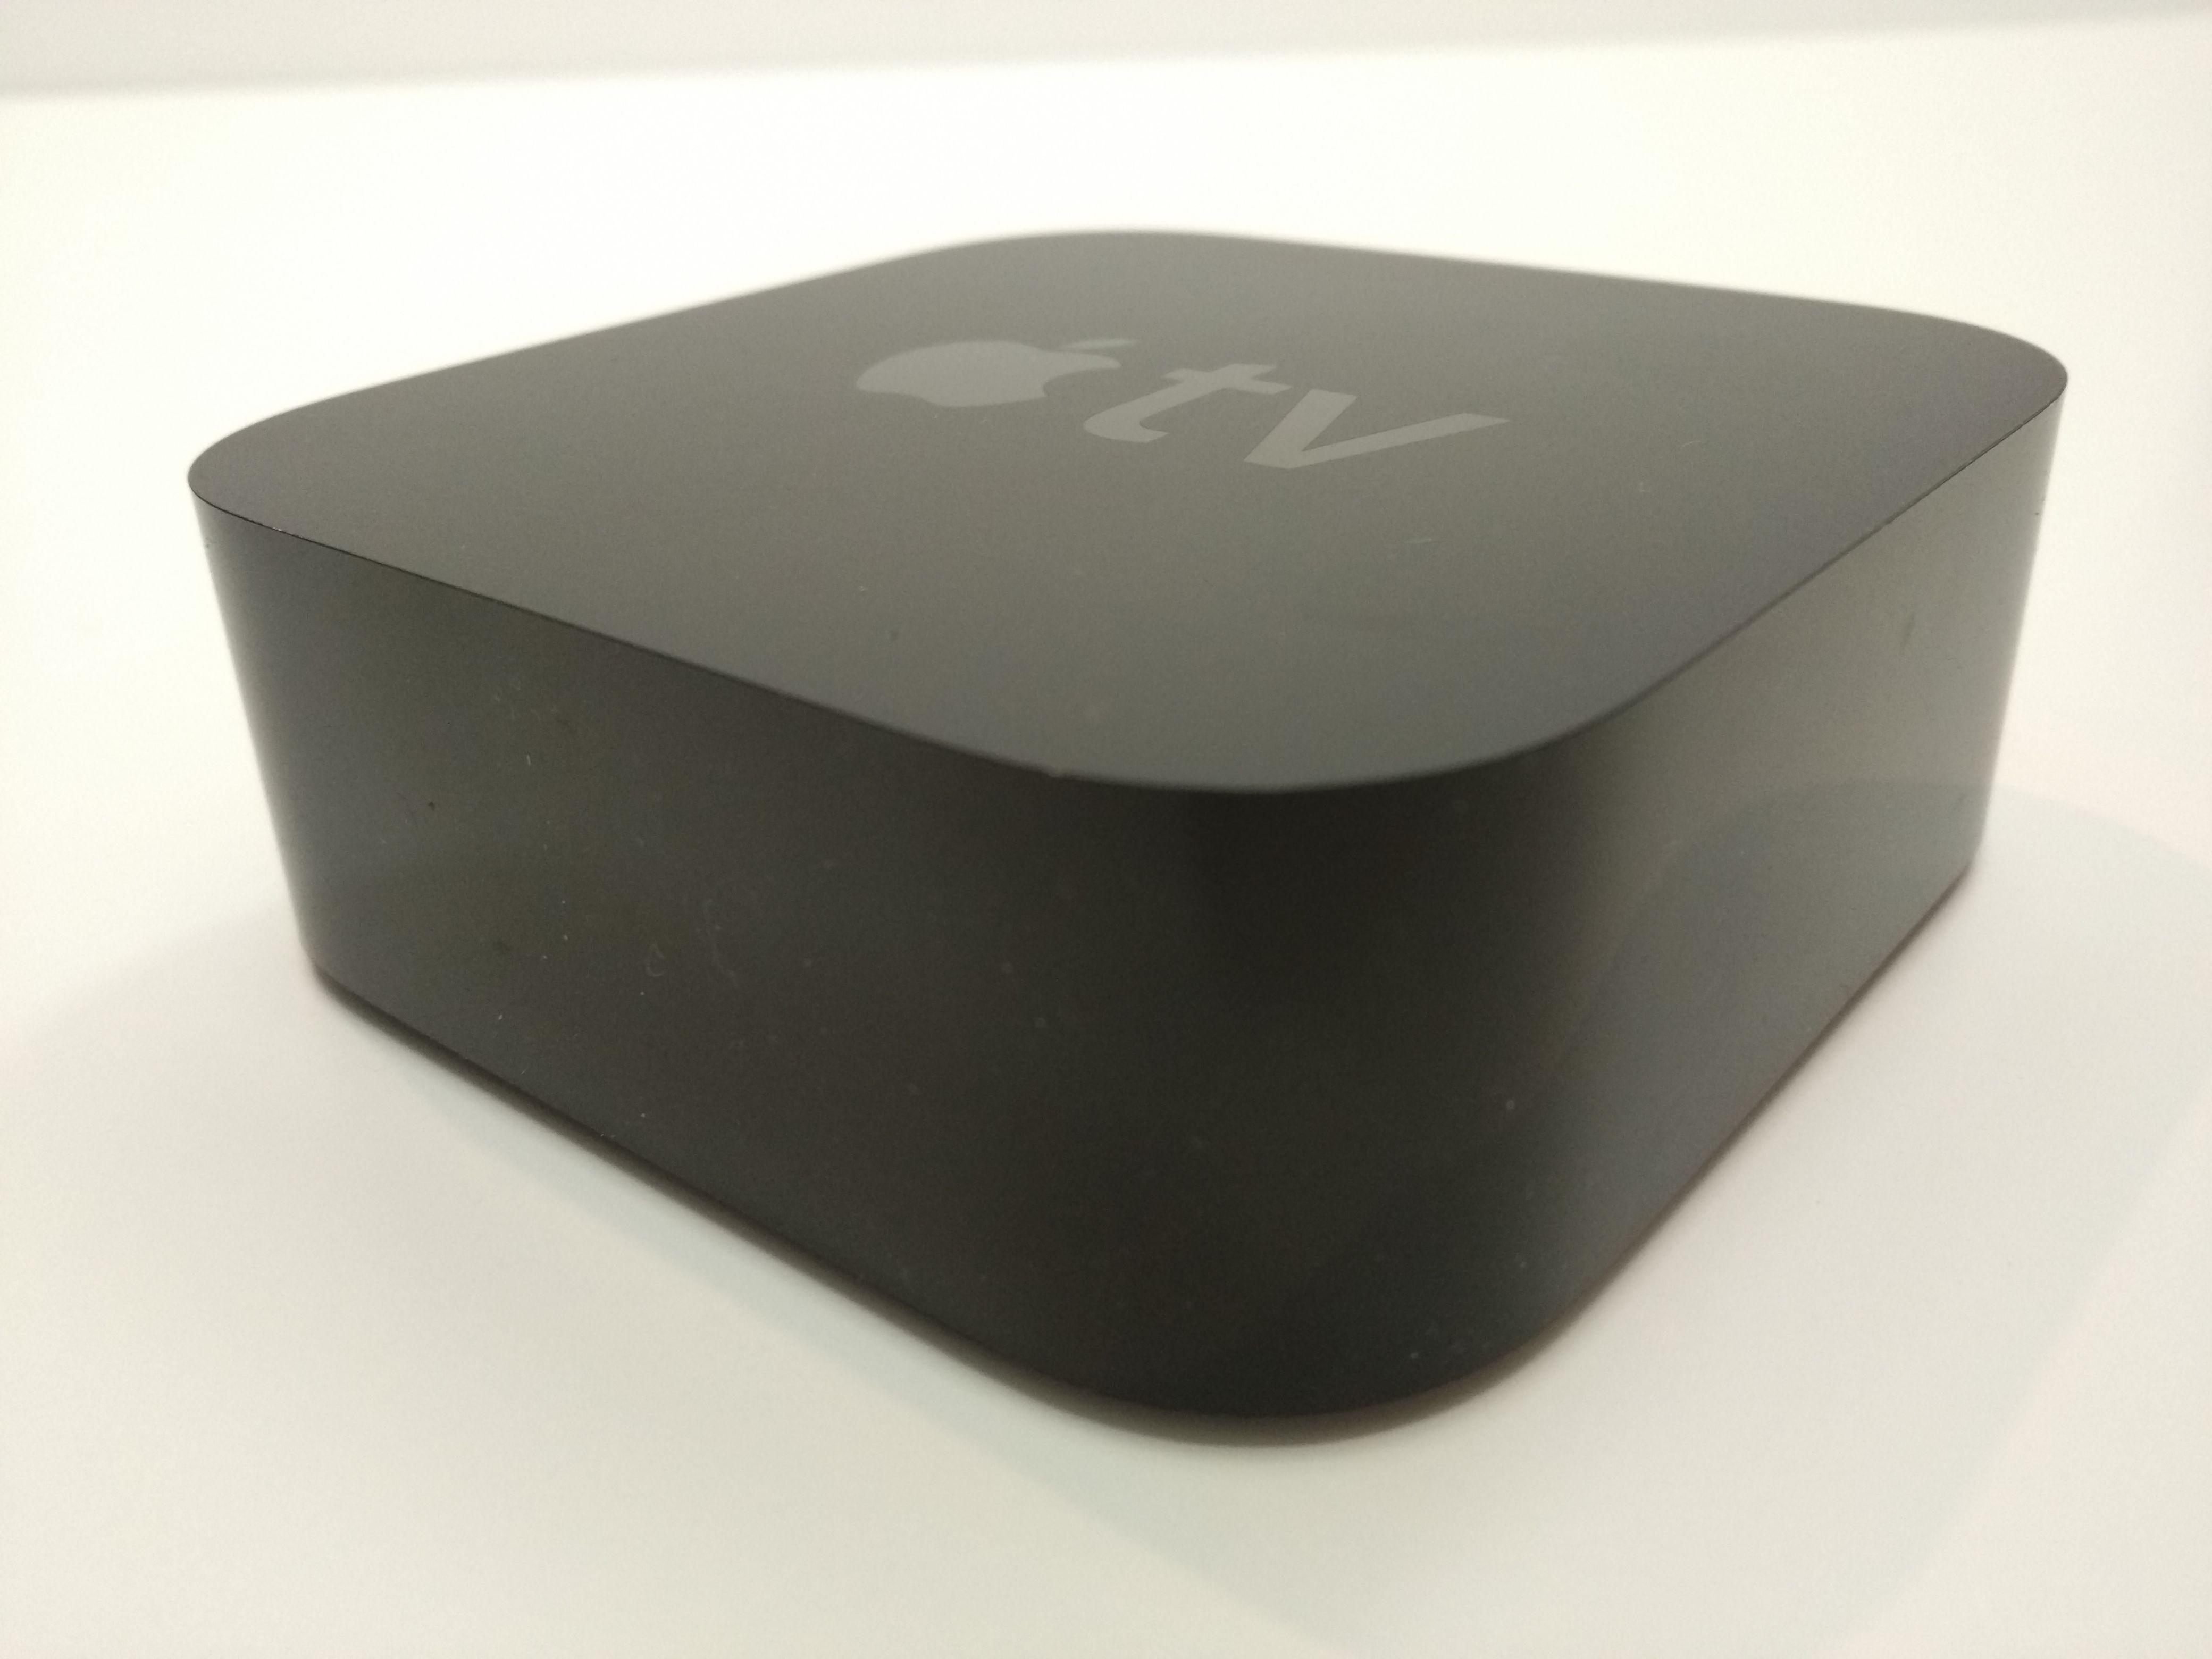 for Apple TV (2015) by Apple Apple, Apple tv